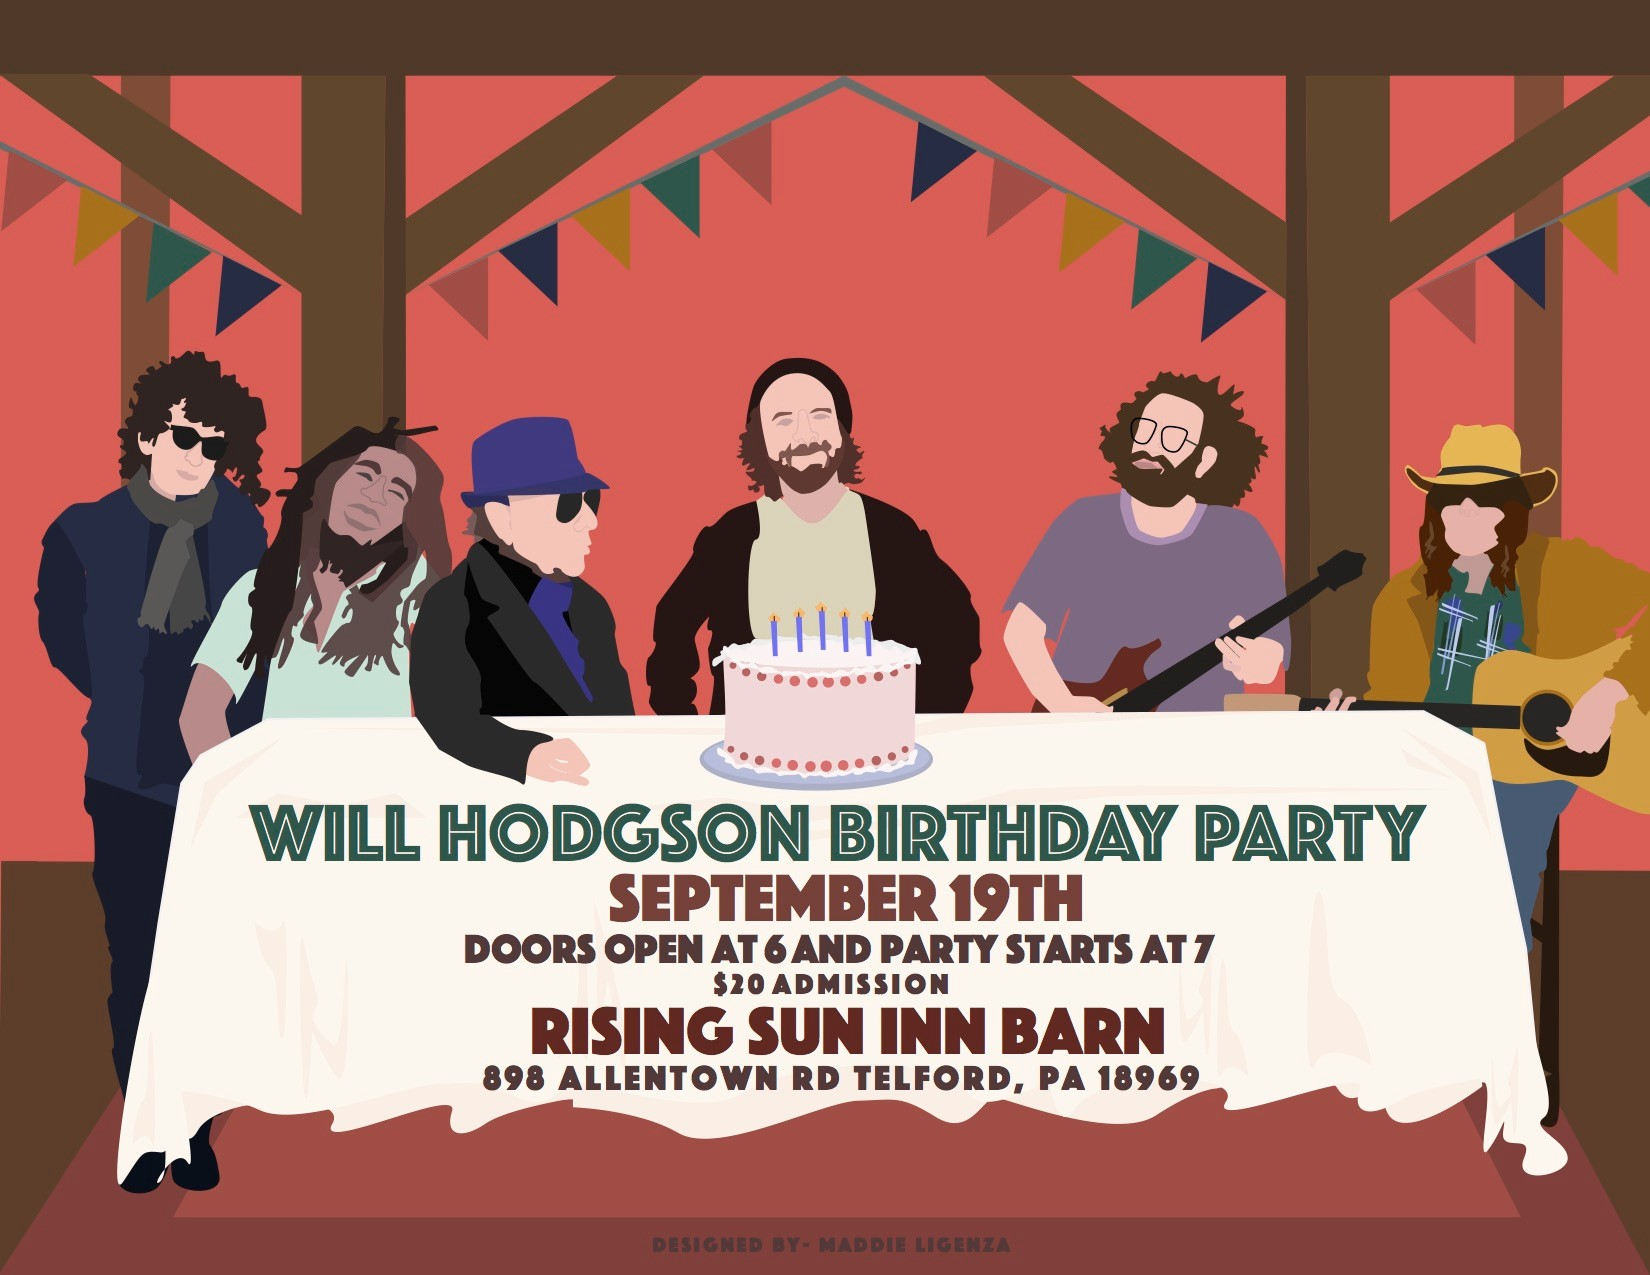 Will Hodgson Birthday Party September 19 2018.jpg